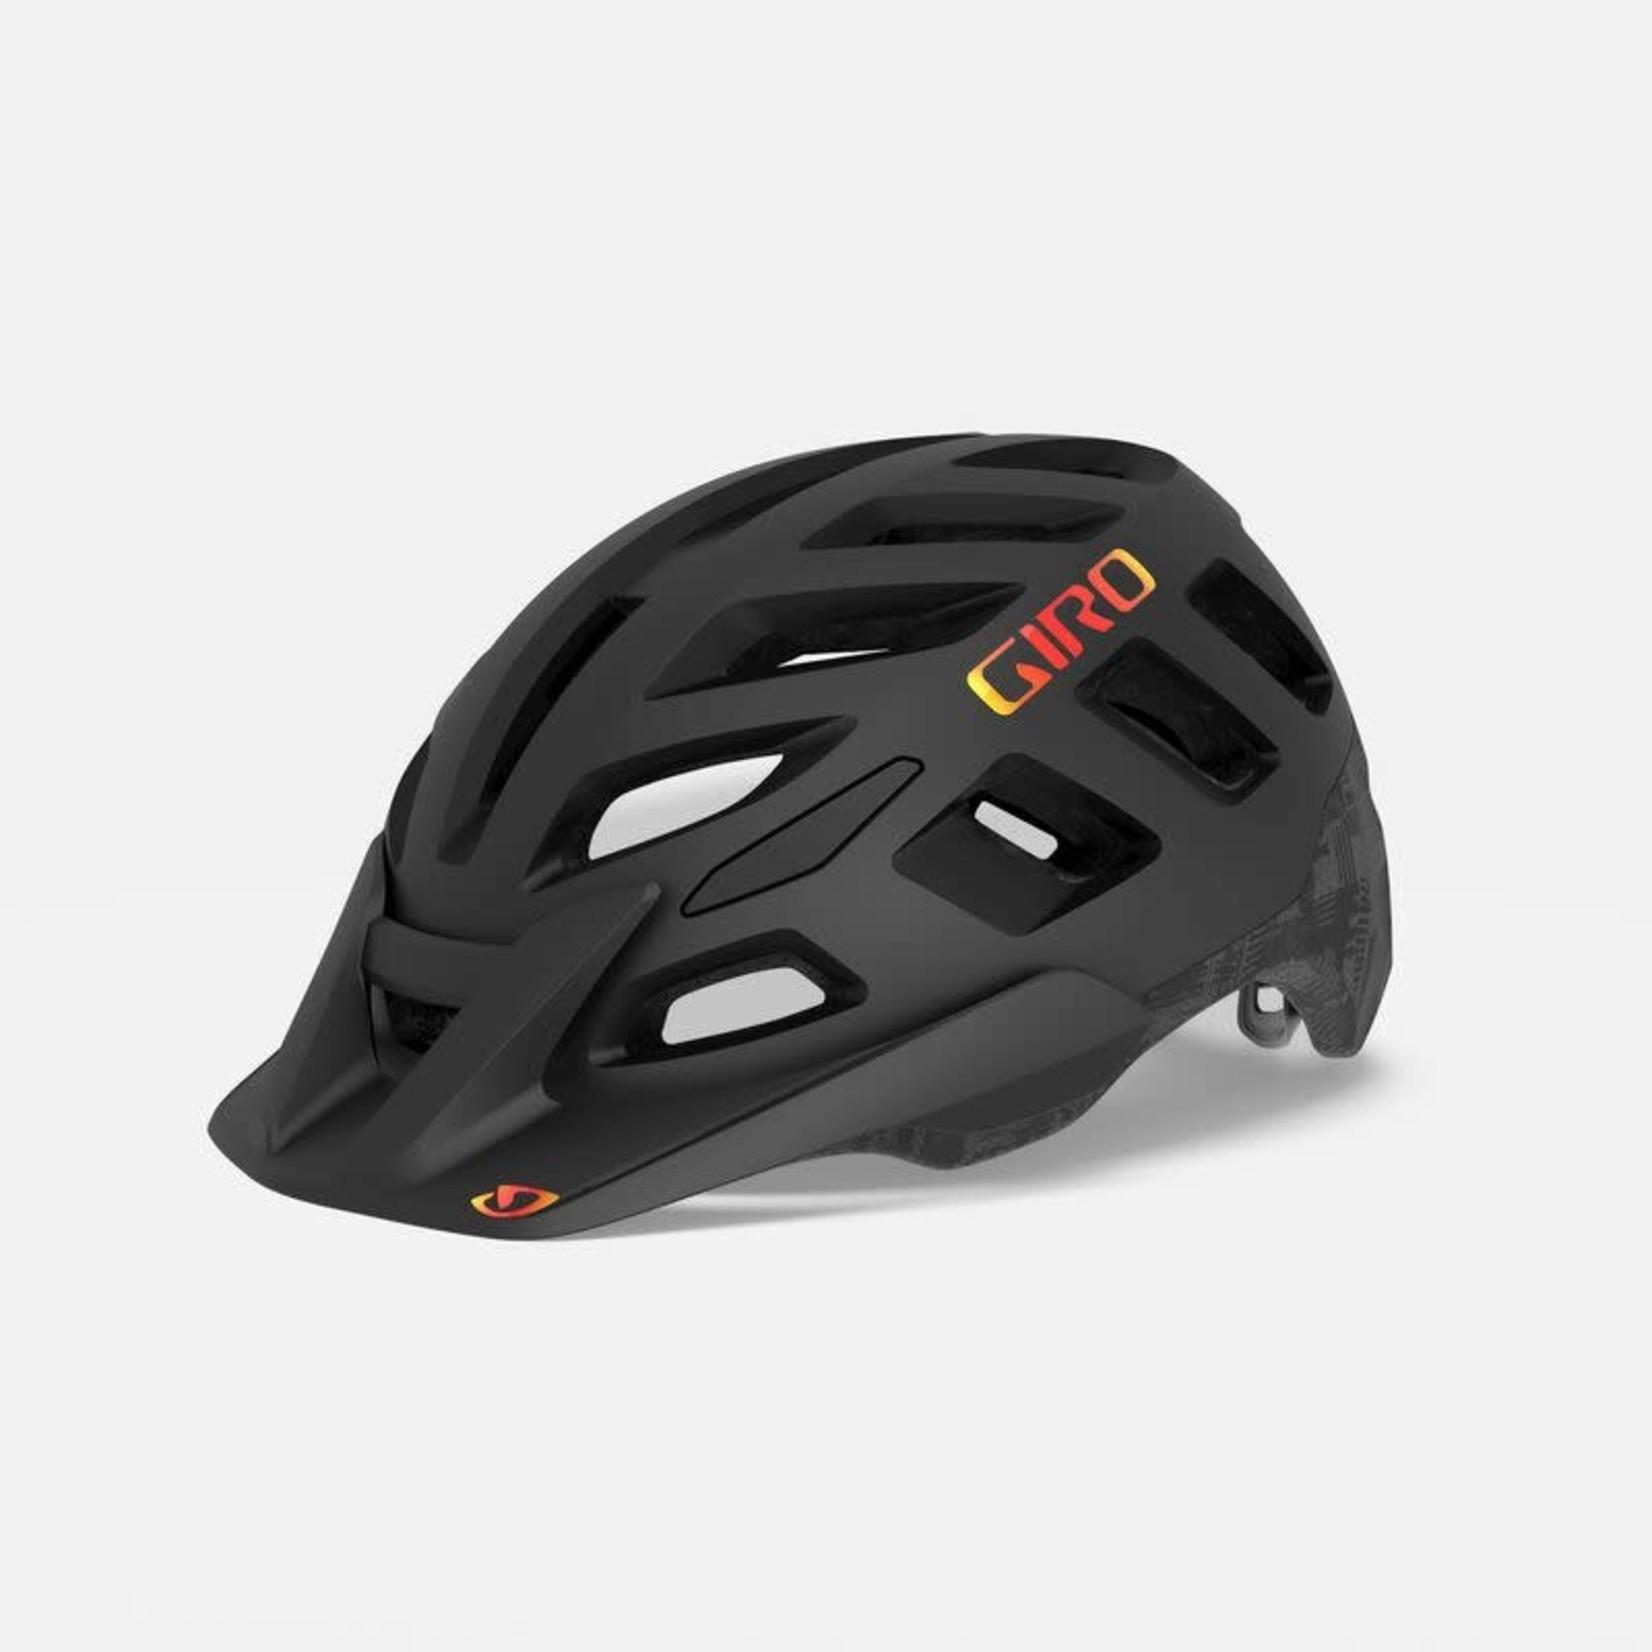 Giro Bike GIRO RADIX MIPS MAT BLK HYP S